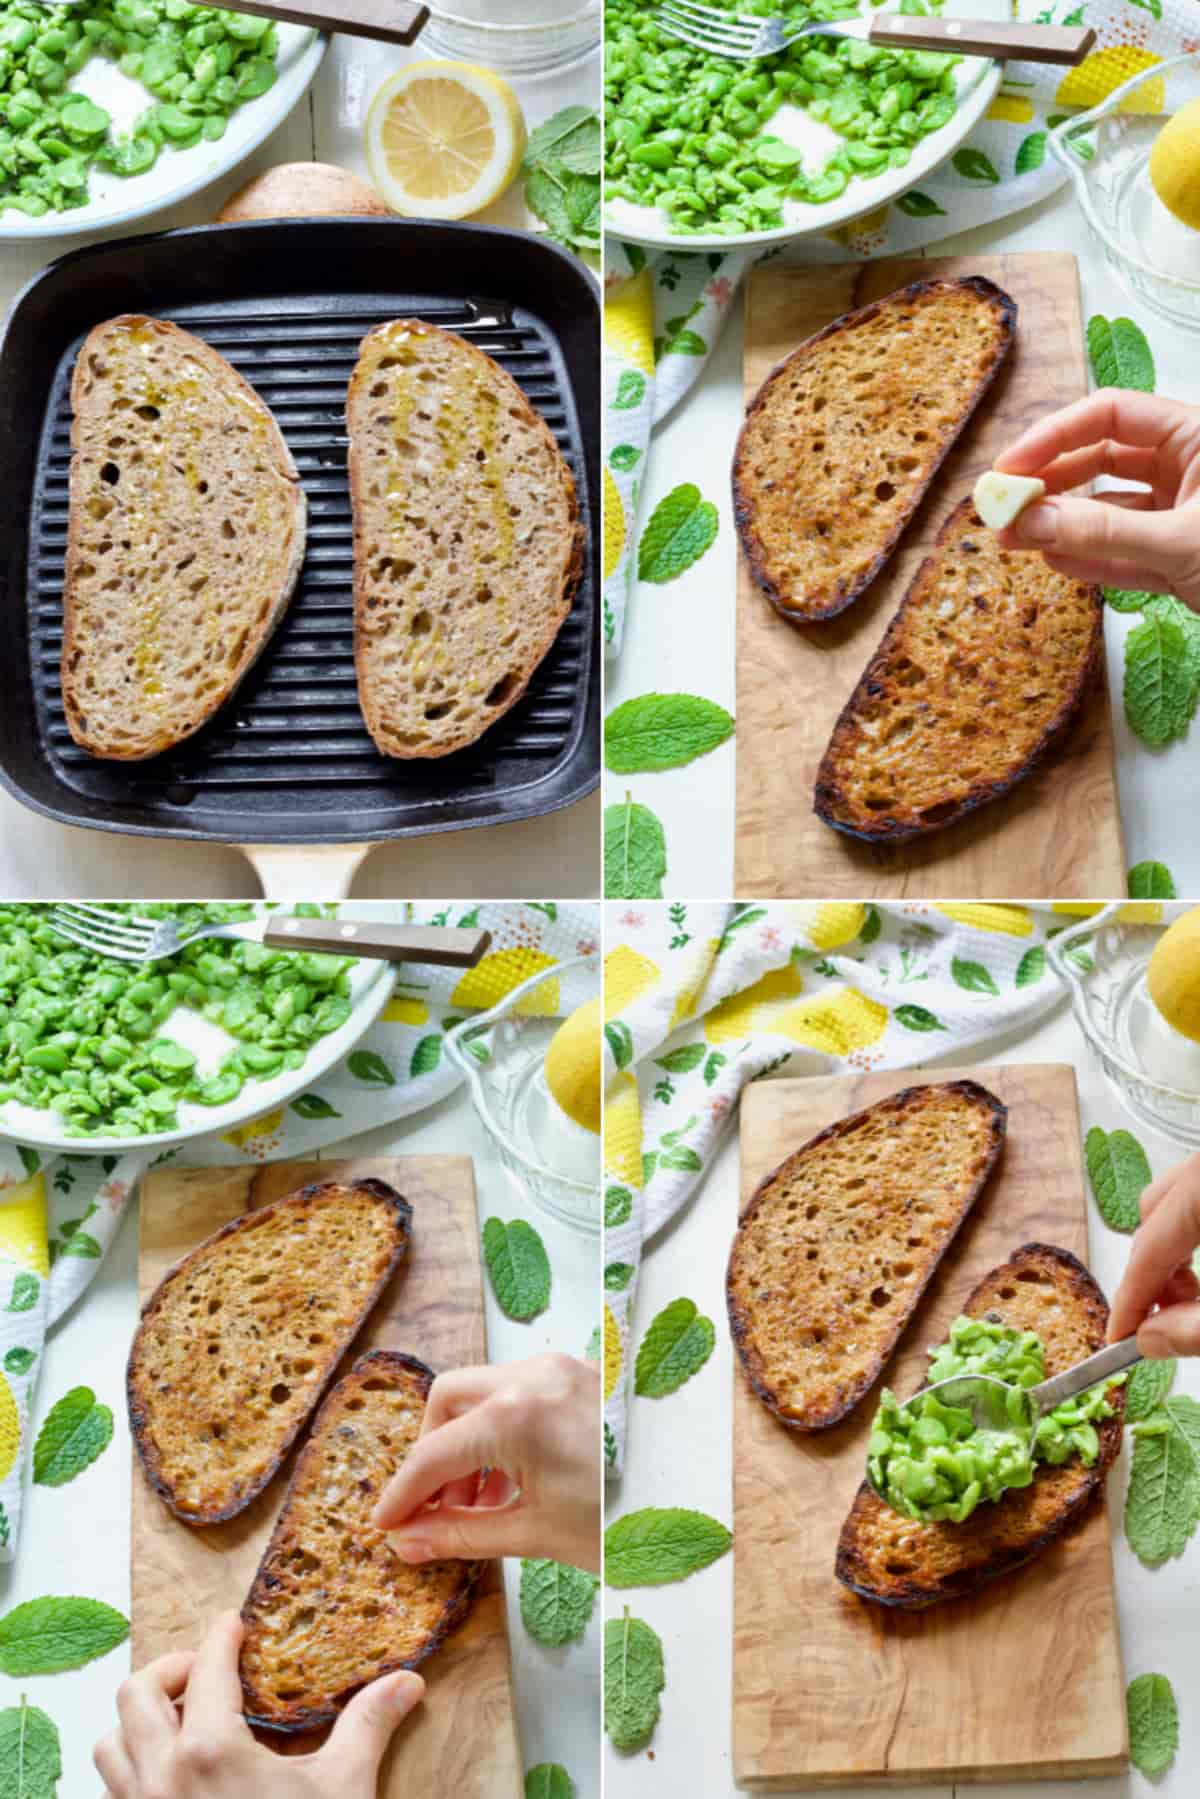 Preparing griddled sourdough toast for bruschetta.